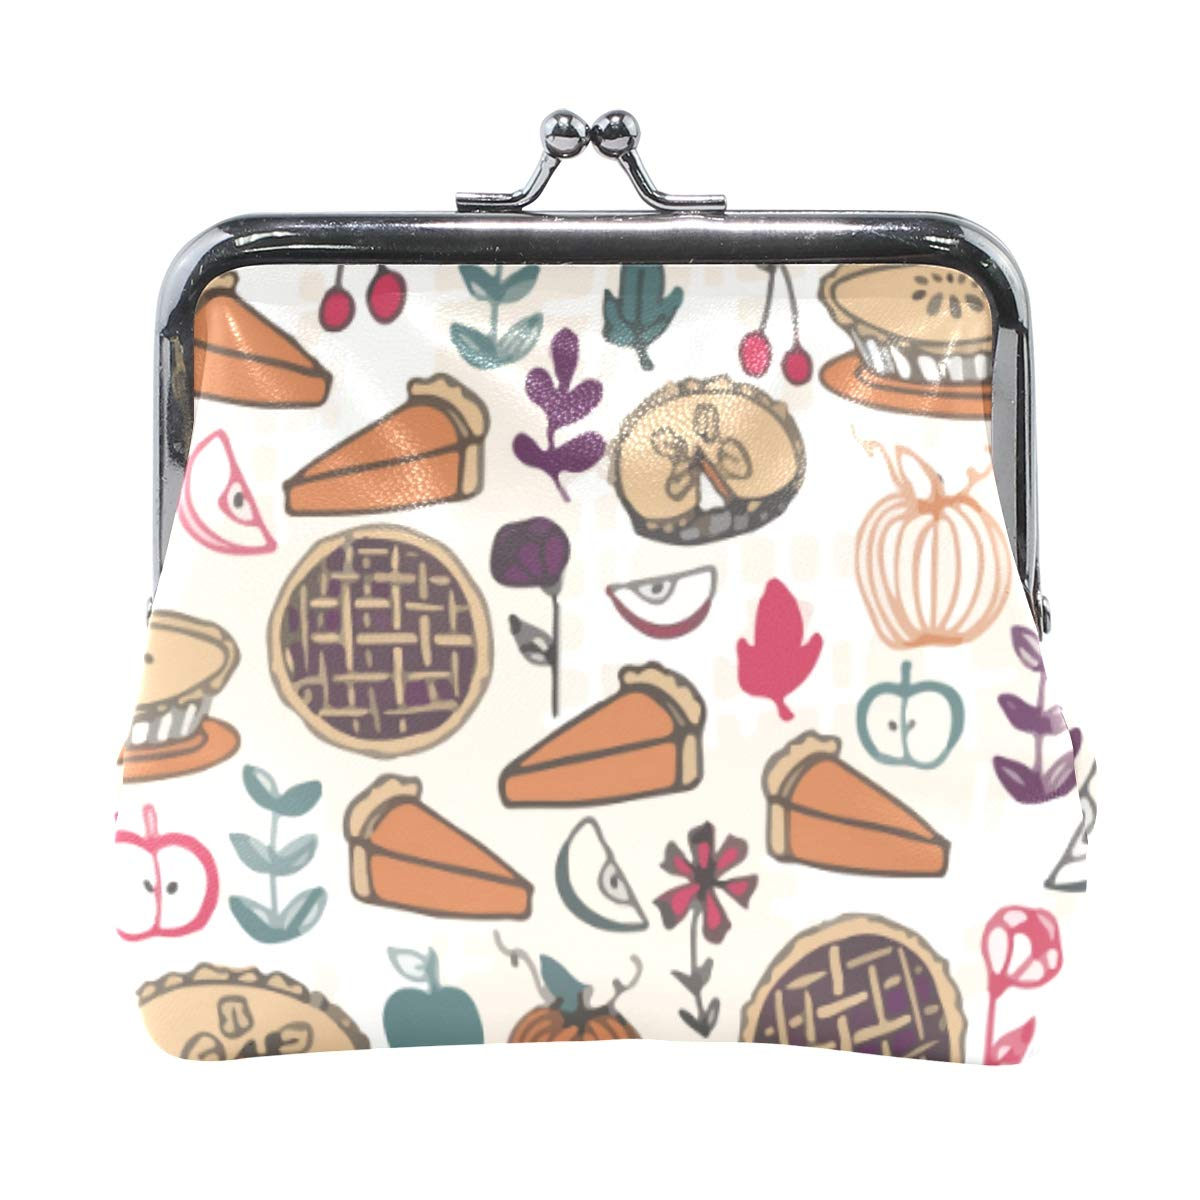 Thanksgiving Pumpkin Apple Pie Coin Purse Buckle Vintage PU Pouch Kiss-lock Wallet for Women Girl